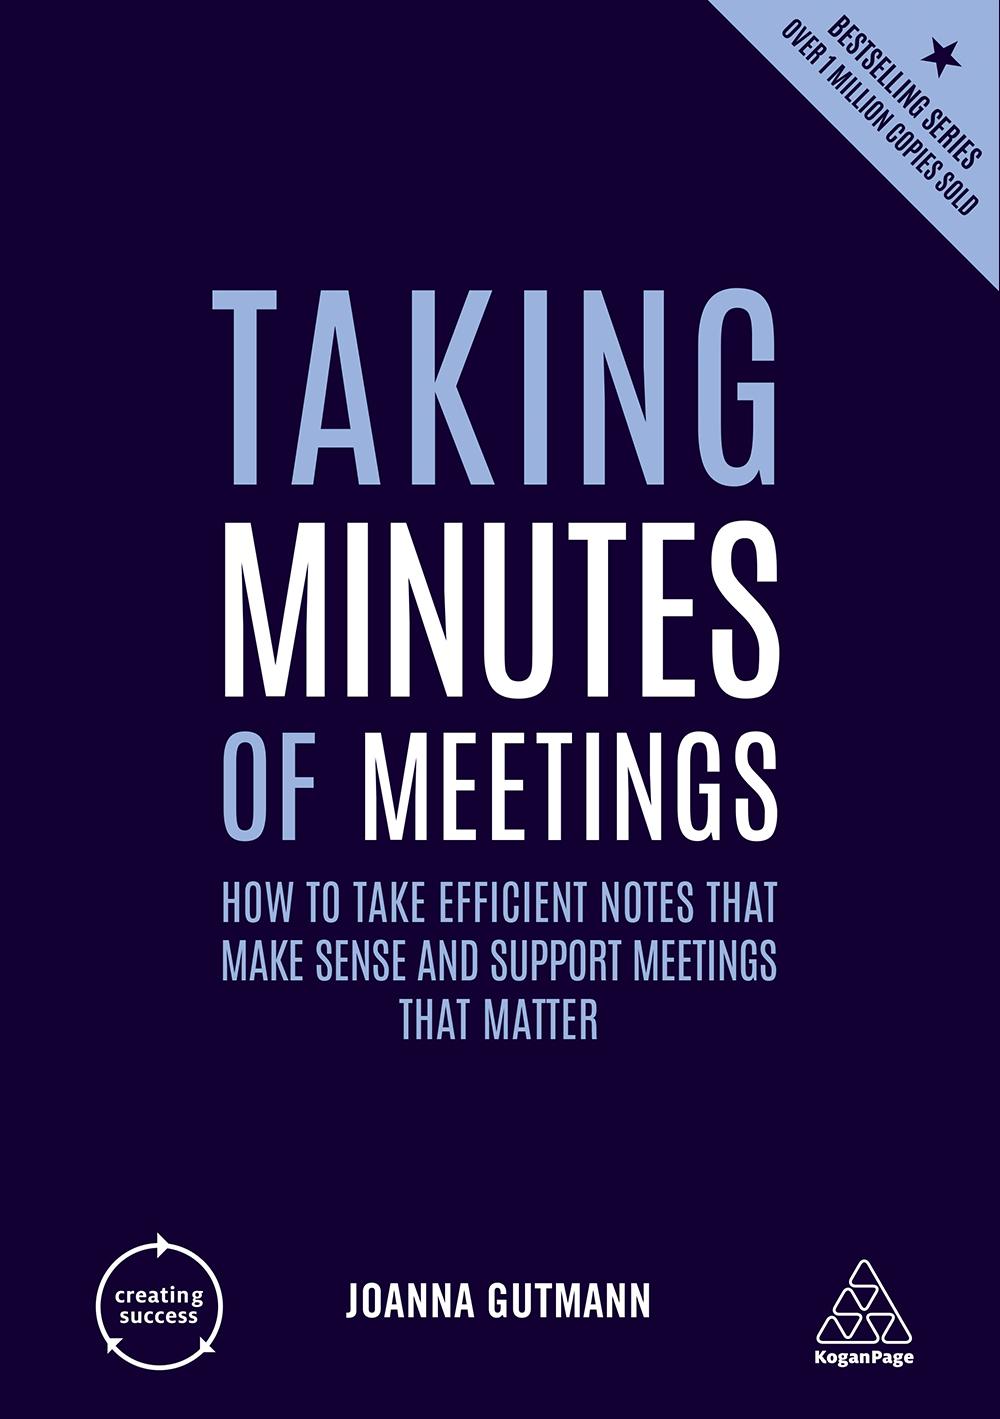 Taking Minutes of Meetings Book